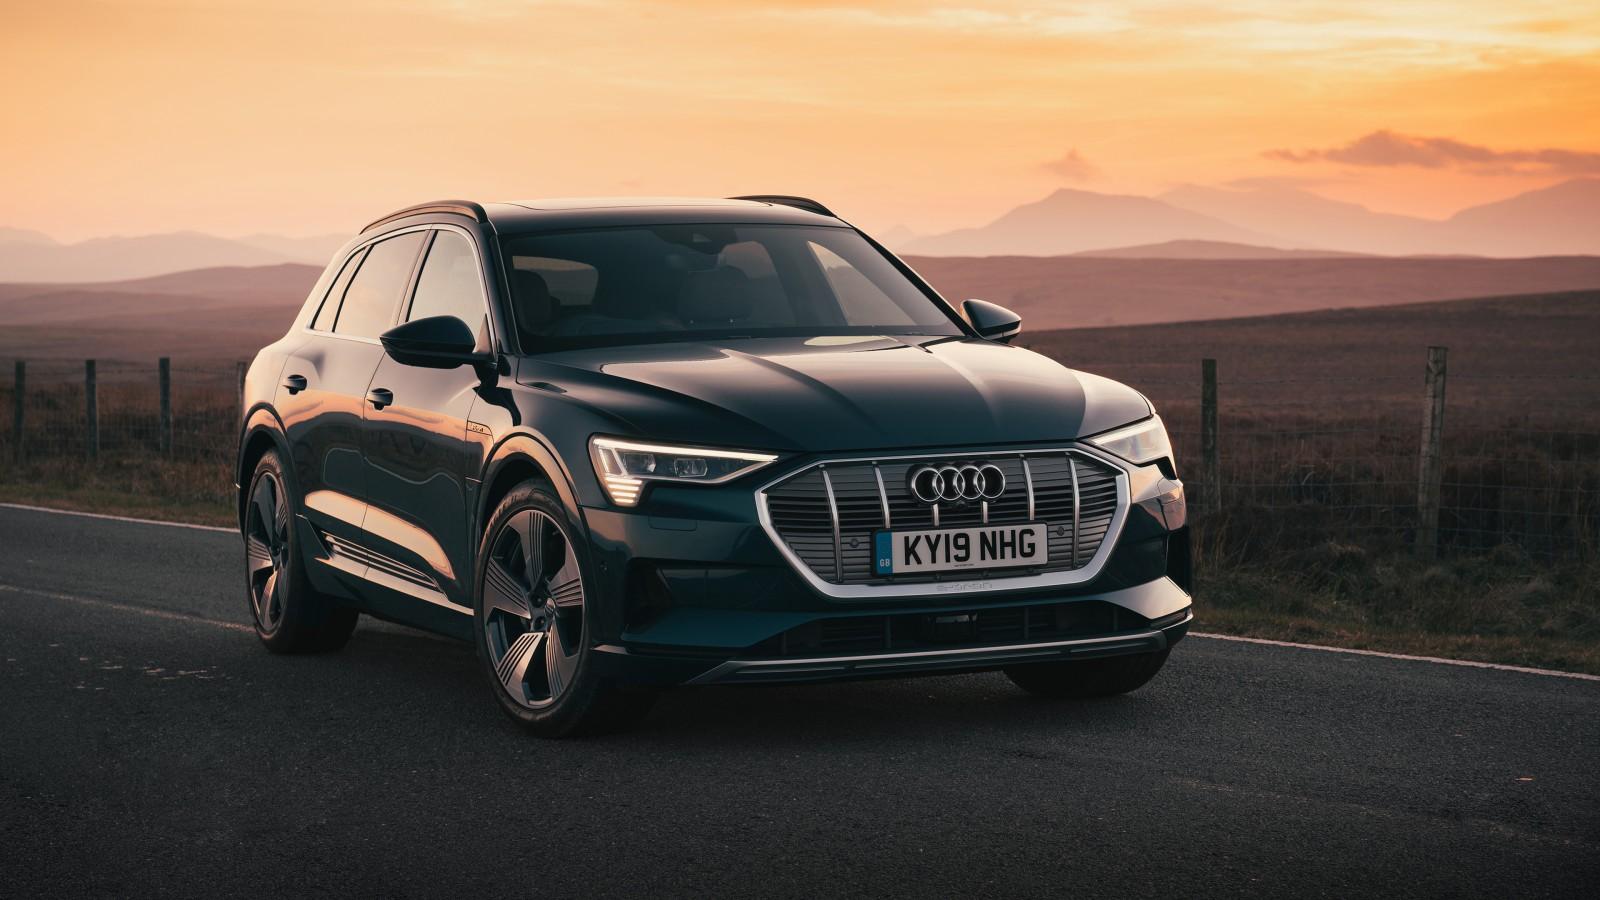 Audi e-tron 55 quattro 2019 4K 2 Wallpaper | HD Car ...